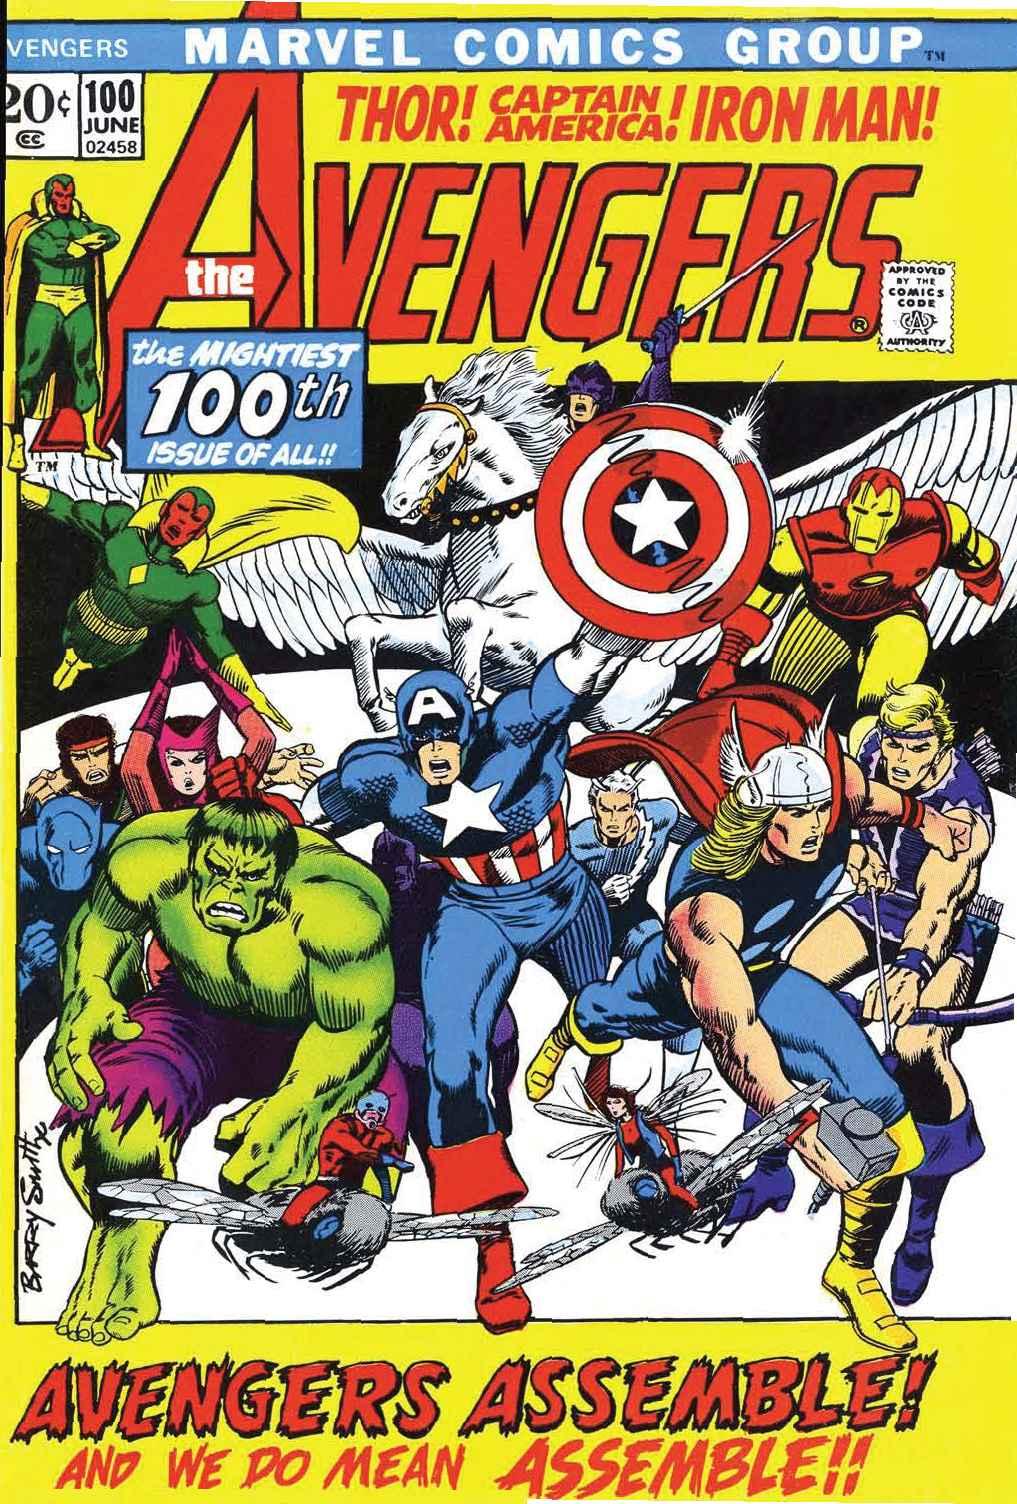 http://img2.wikia.nocookie.net/__cb20080228171014/marveldatabase/images/8/85/Avengers_Vol_1_100.jpg